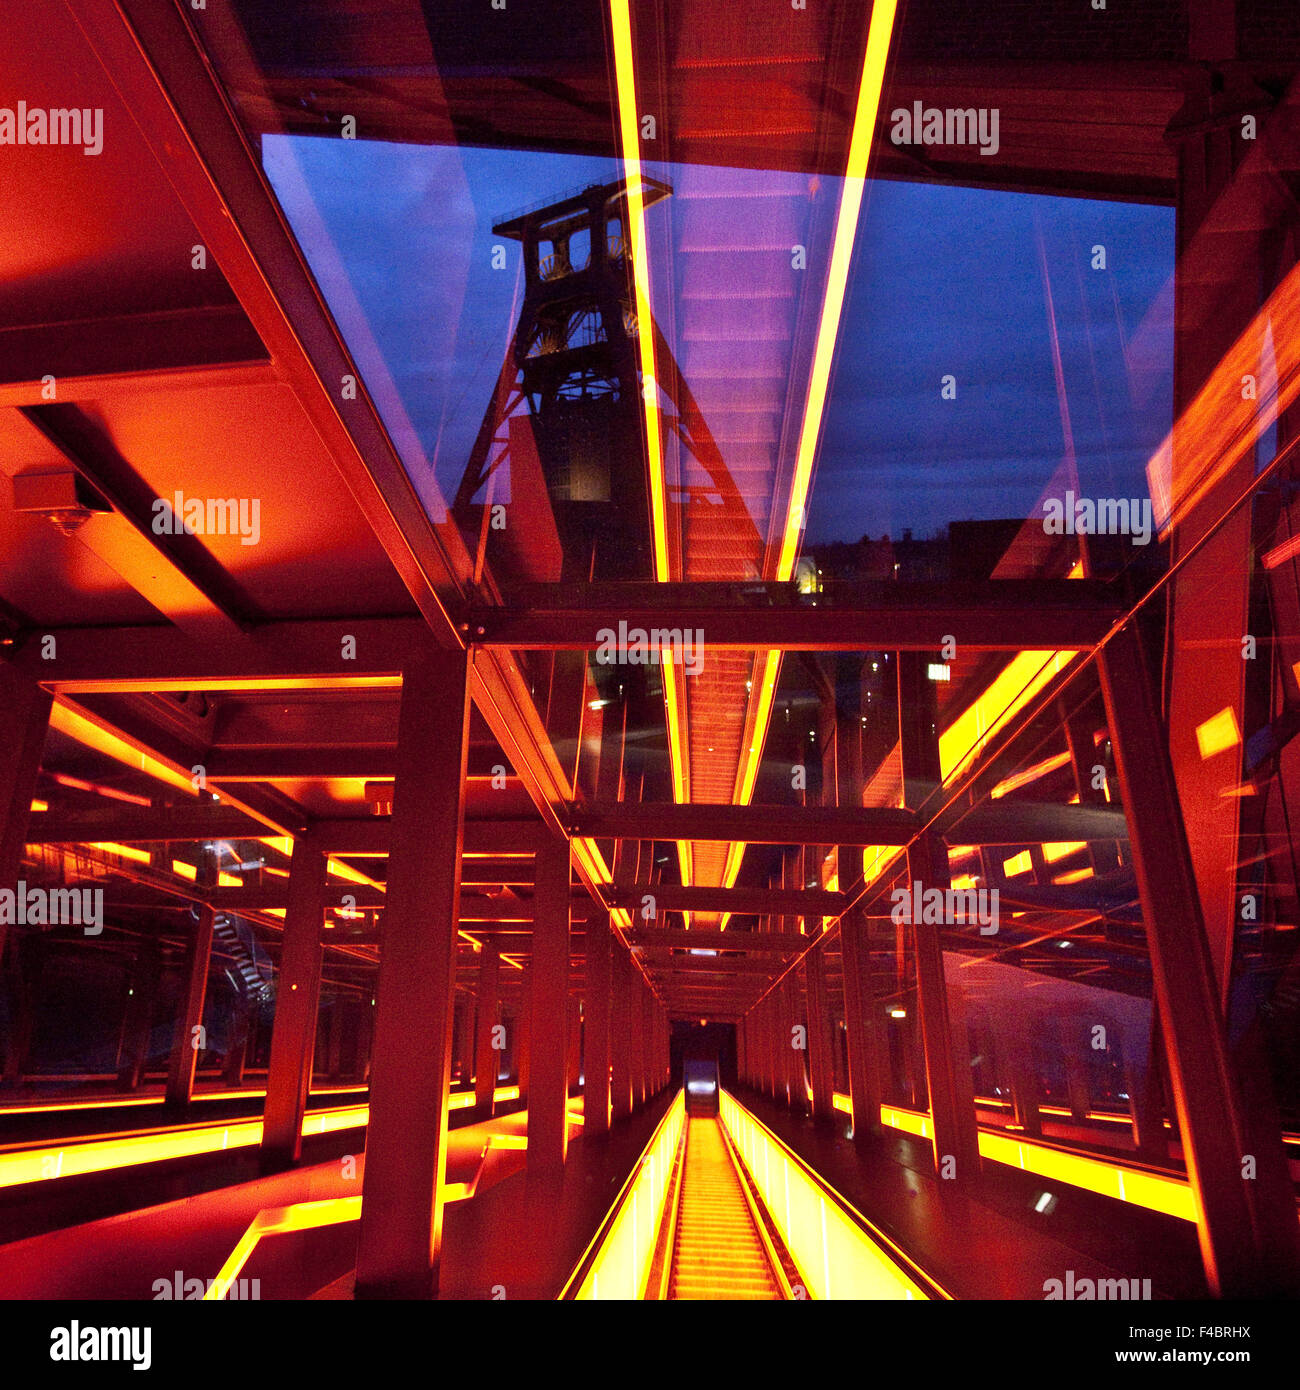 Gangway, Zollverein, Essen, Germany - Stock Image